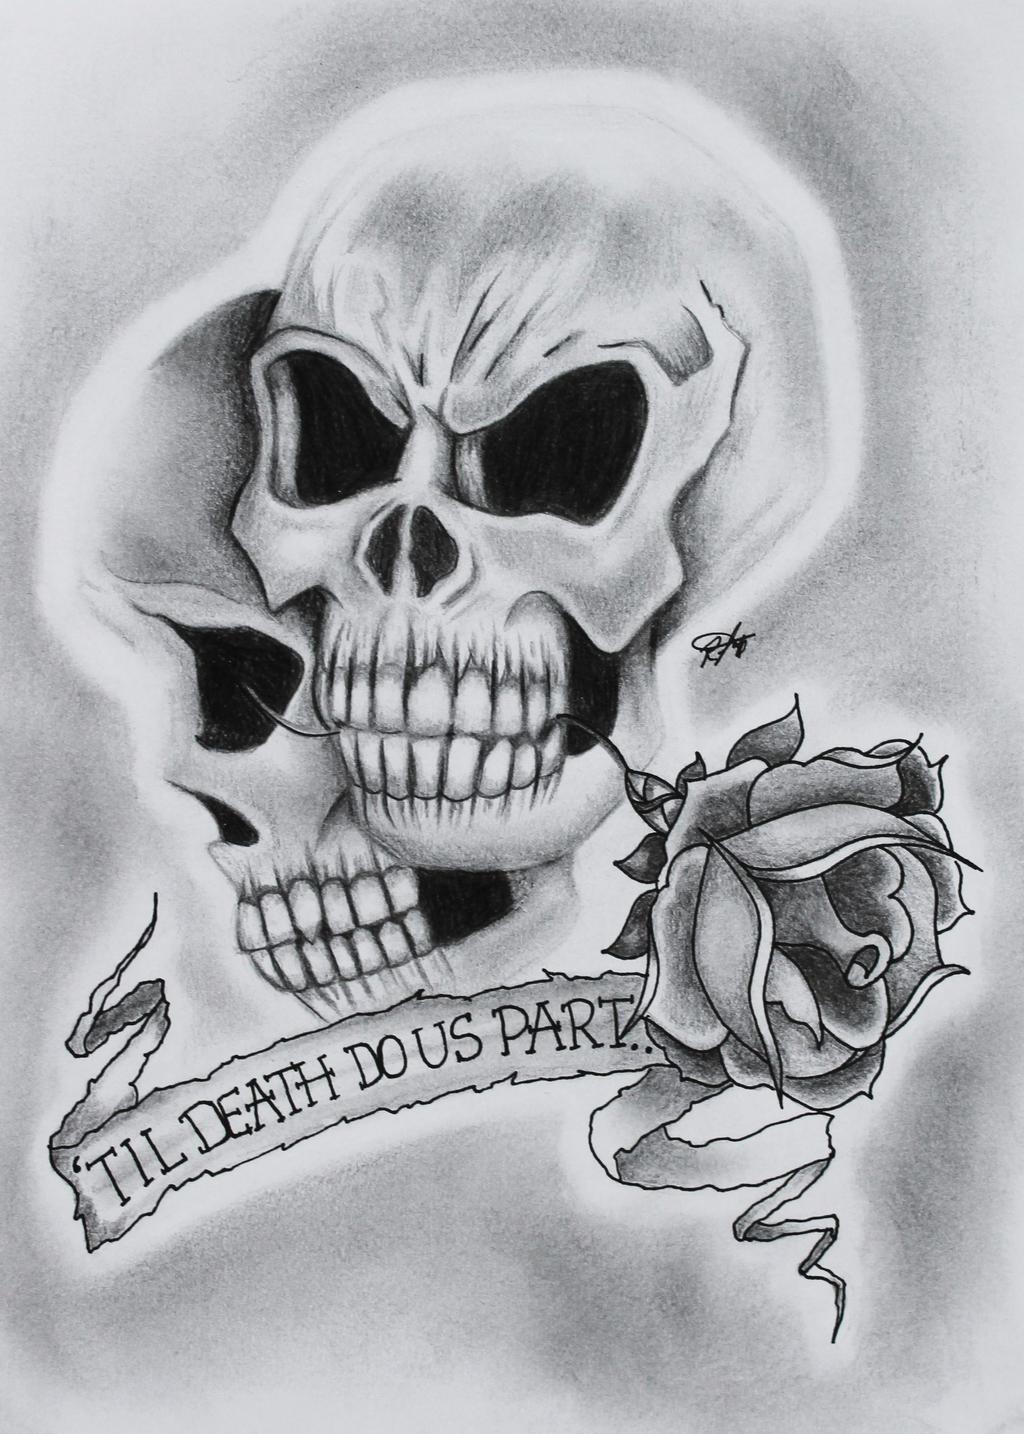 Til Death Do Us Part By Rachaelelizabethfry On Deviantart